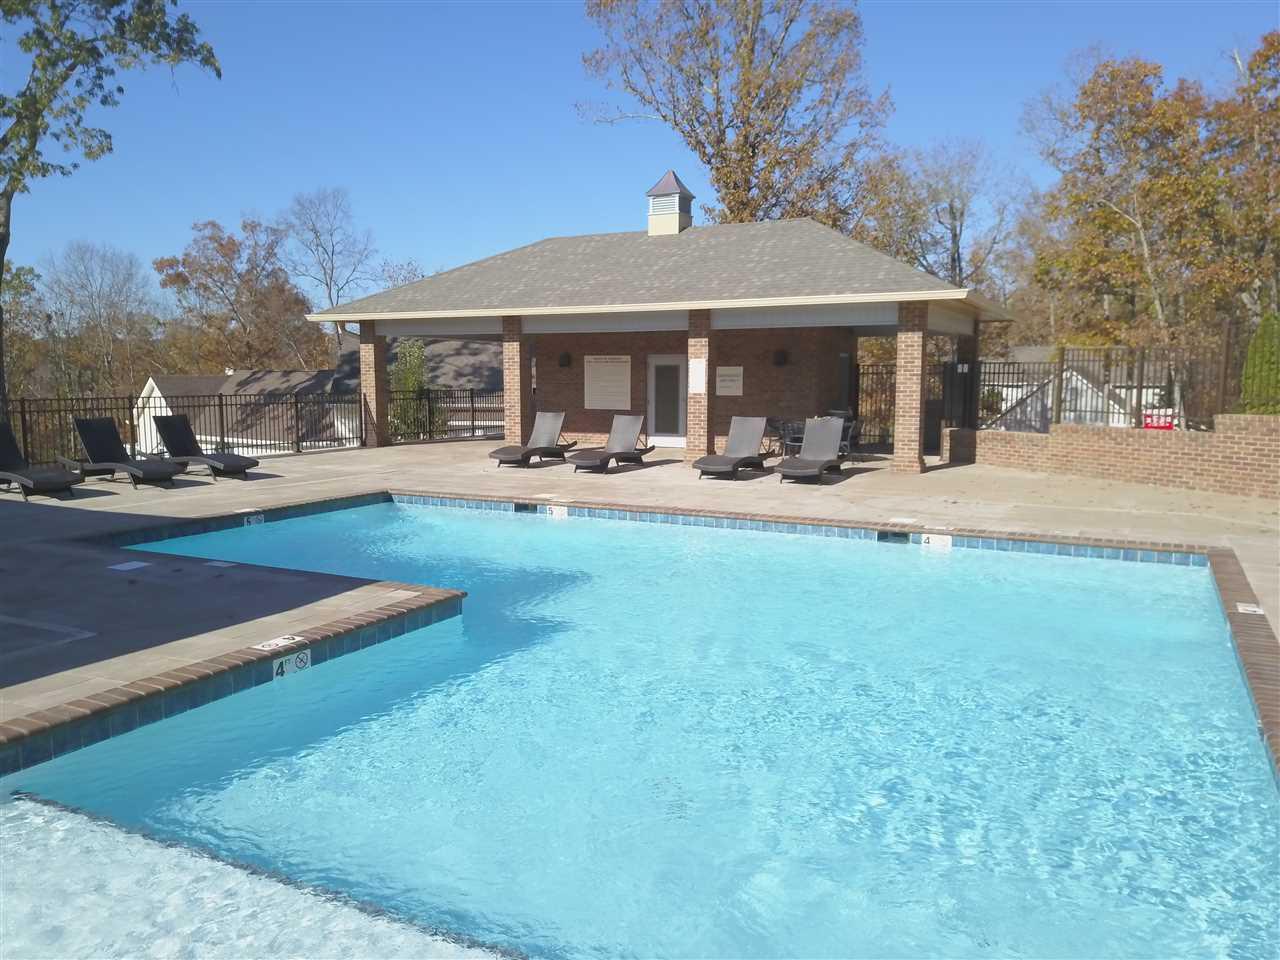 165 Anderson Hollow Savannah, TN 38372 - MLS #: 10021195